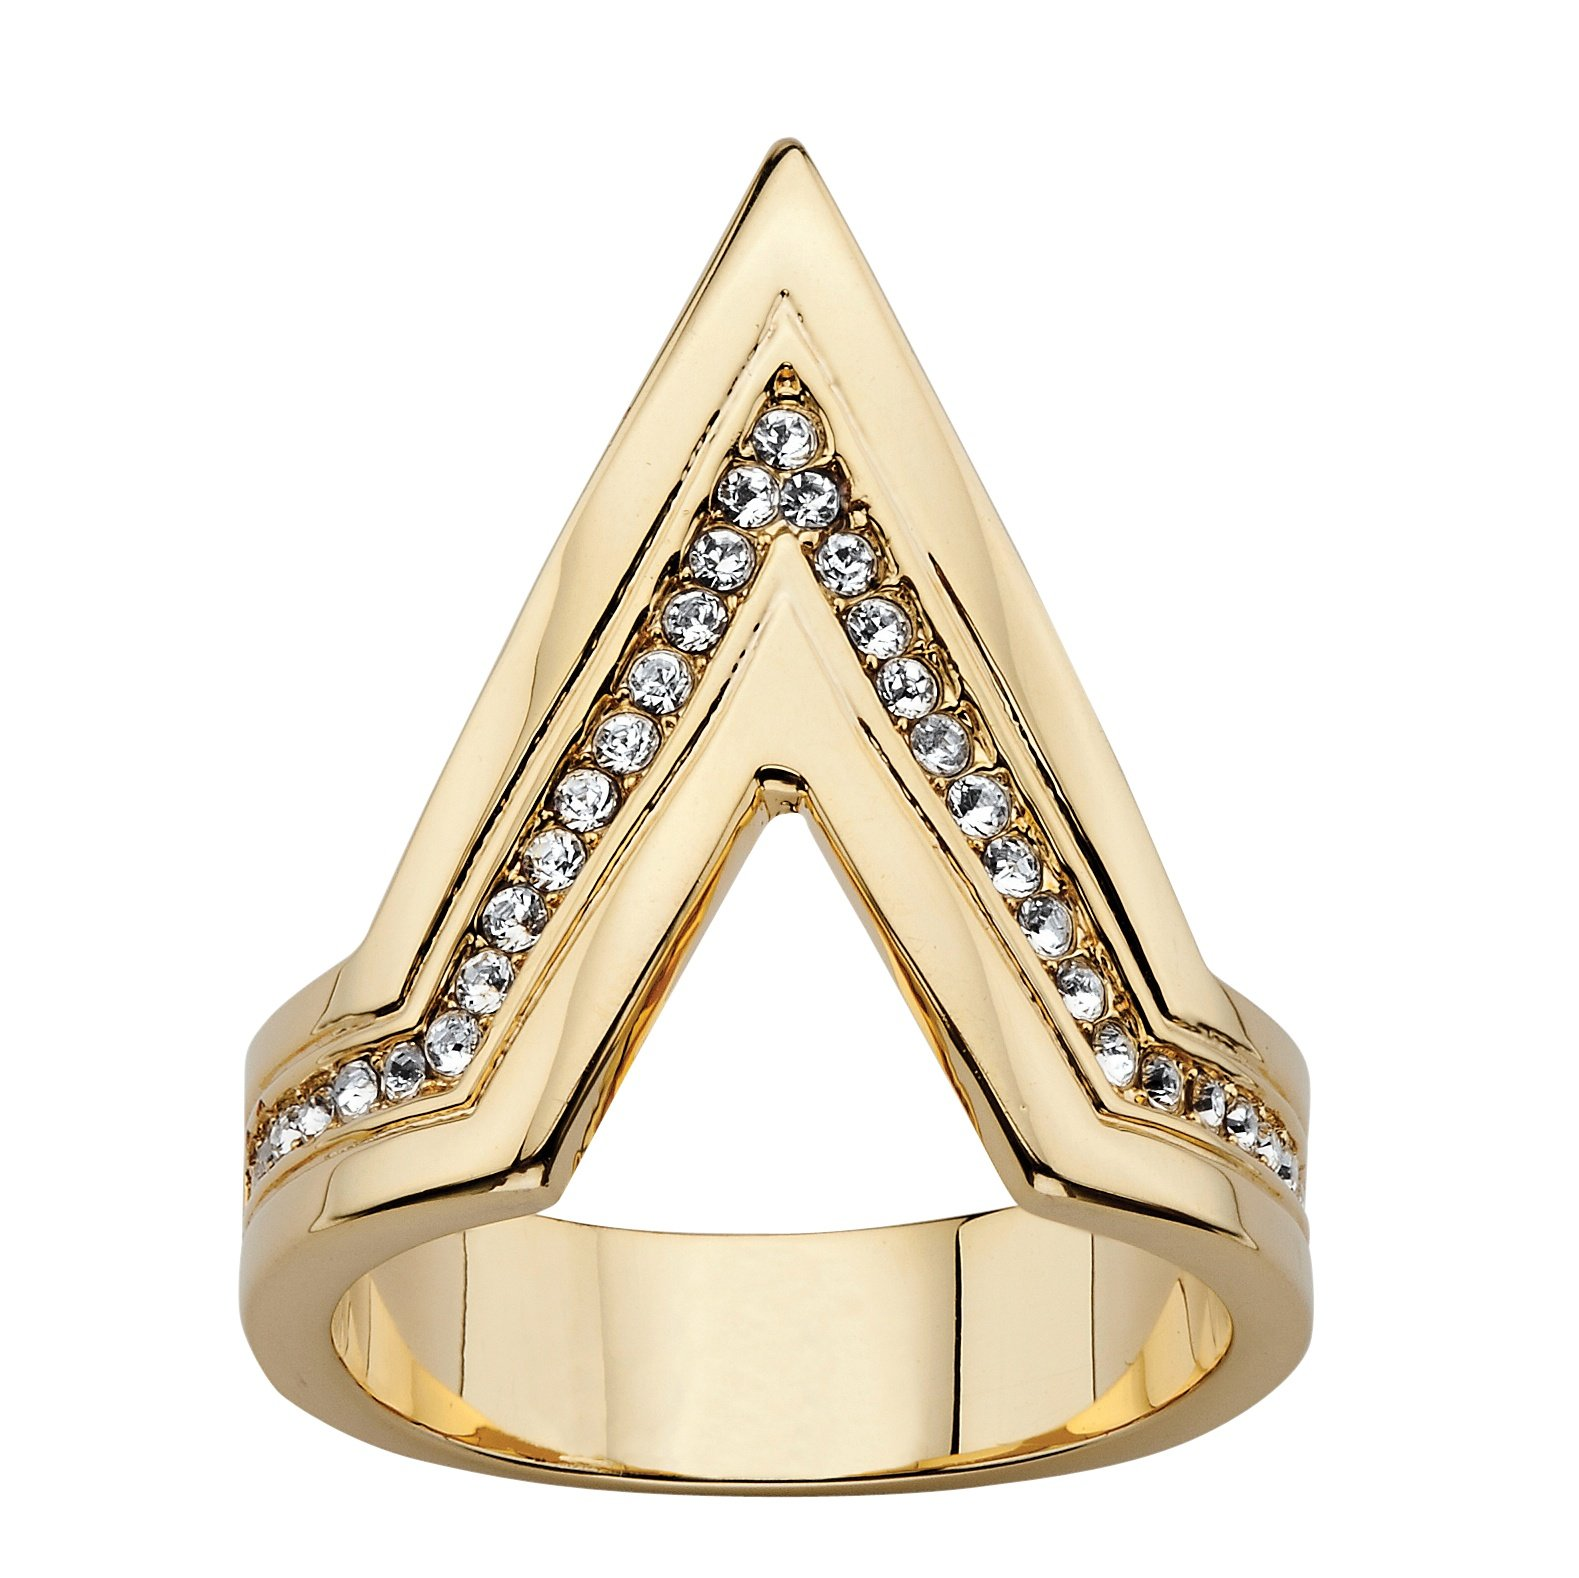 Seta Jewelry 14K Gold-Plated Round Crystal Chevron Ring Made with Swarovski Elements